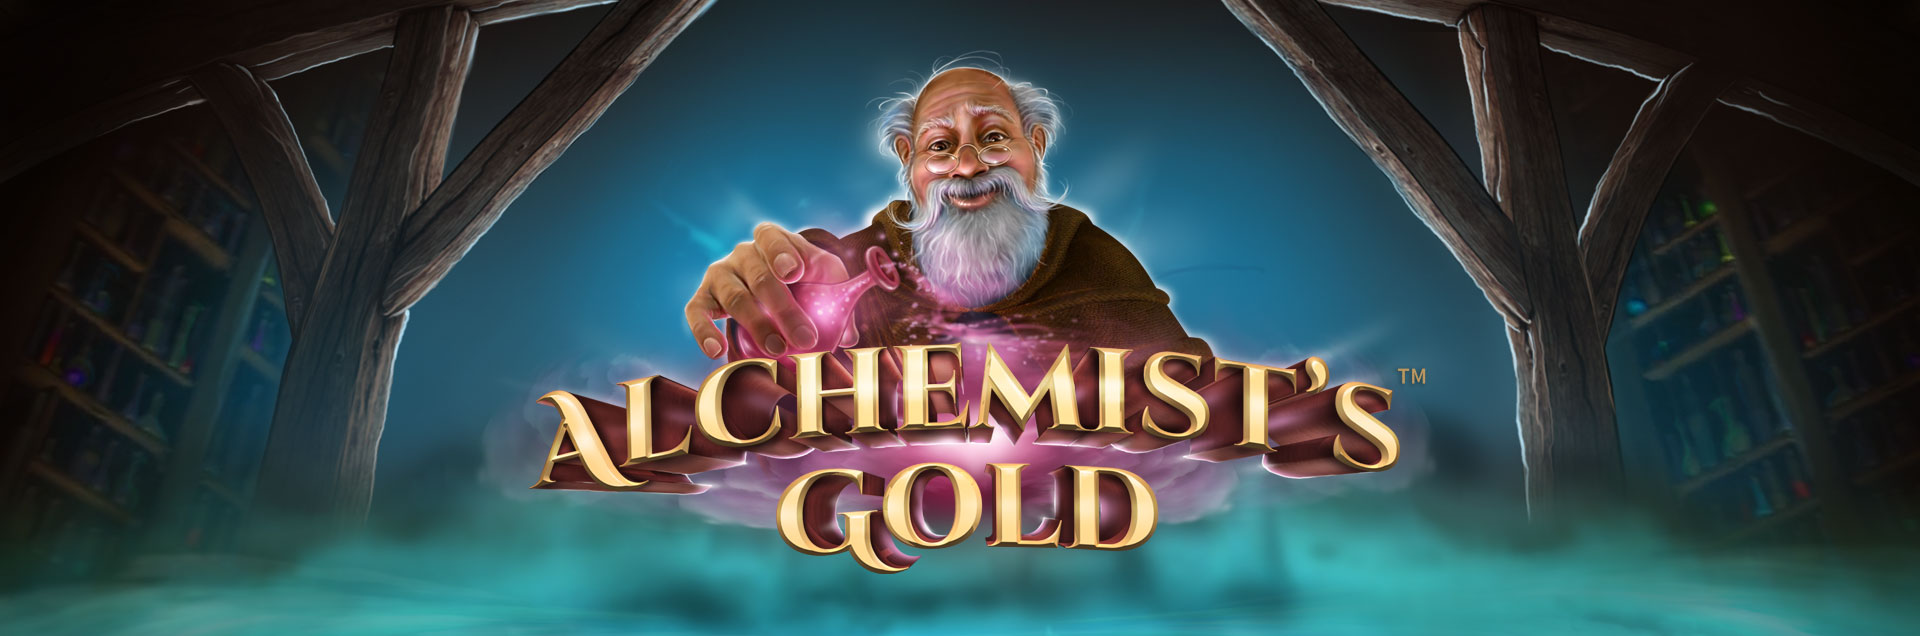 AlchemistGold logo